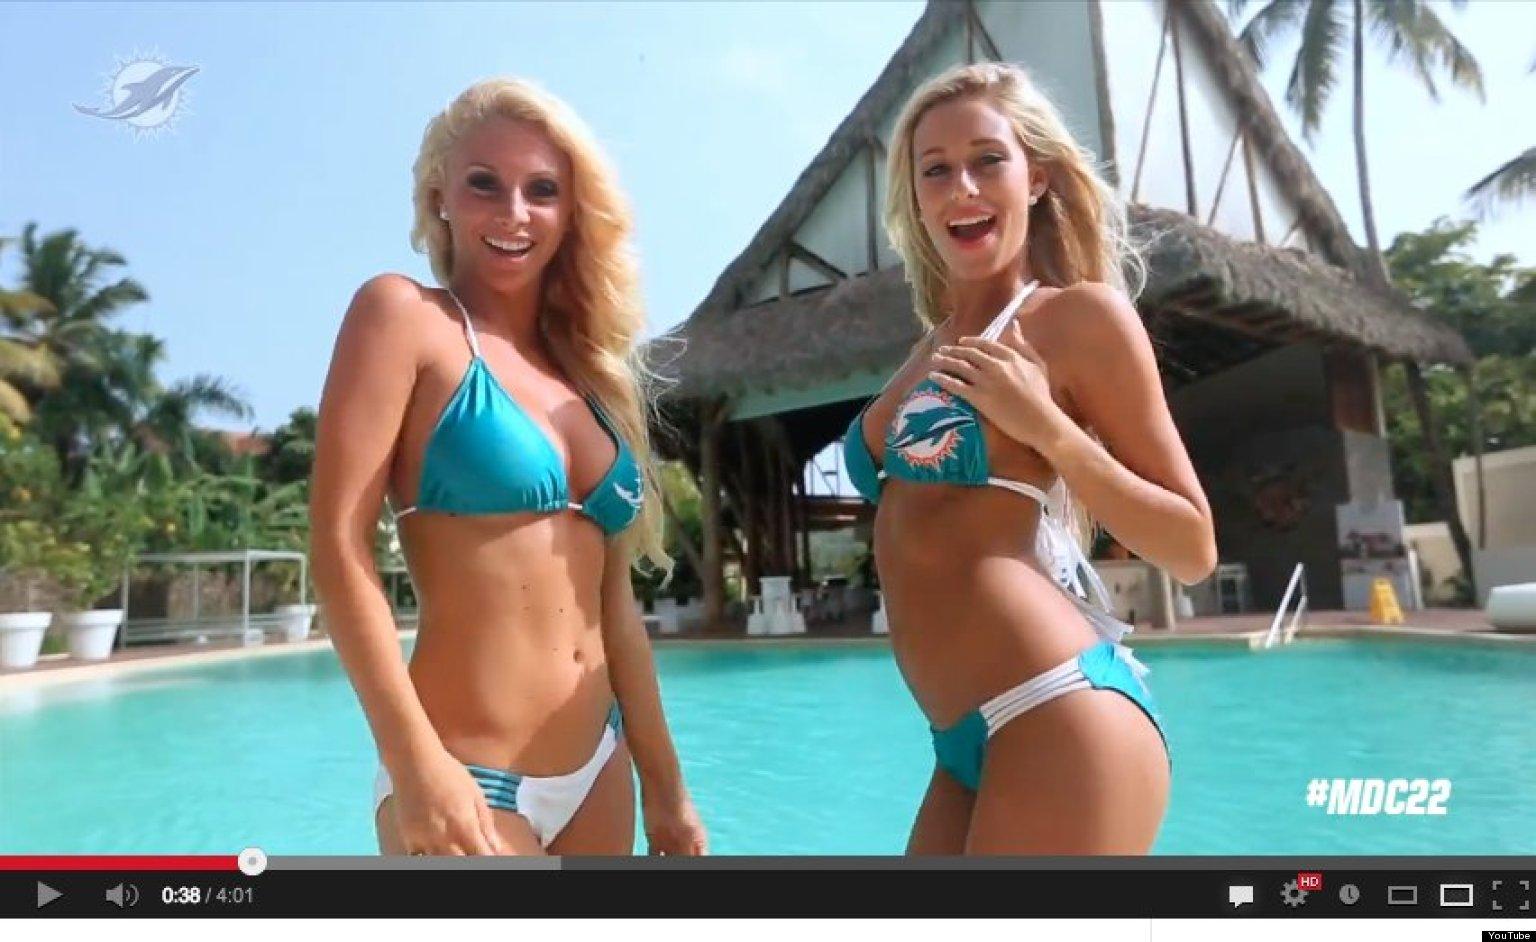 Miami Dolphins Cheerleaders Film Taylor Swift's '22